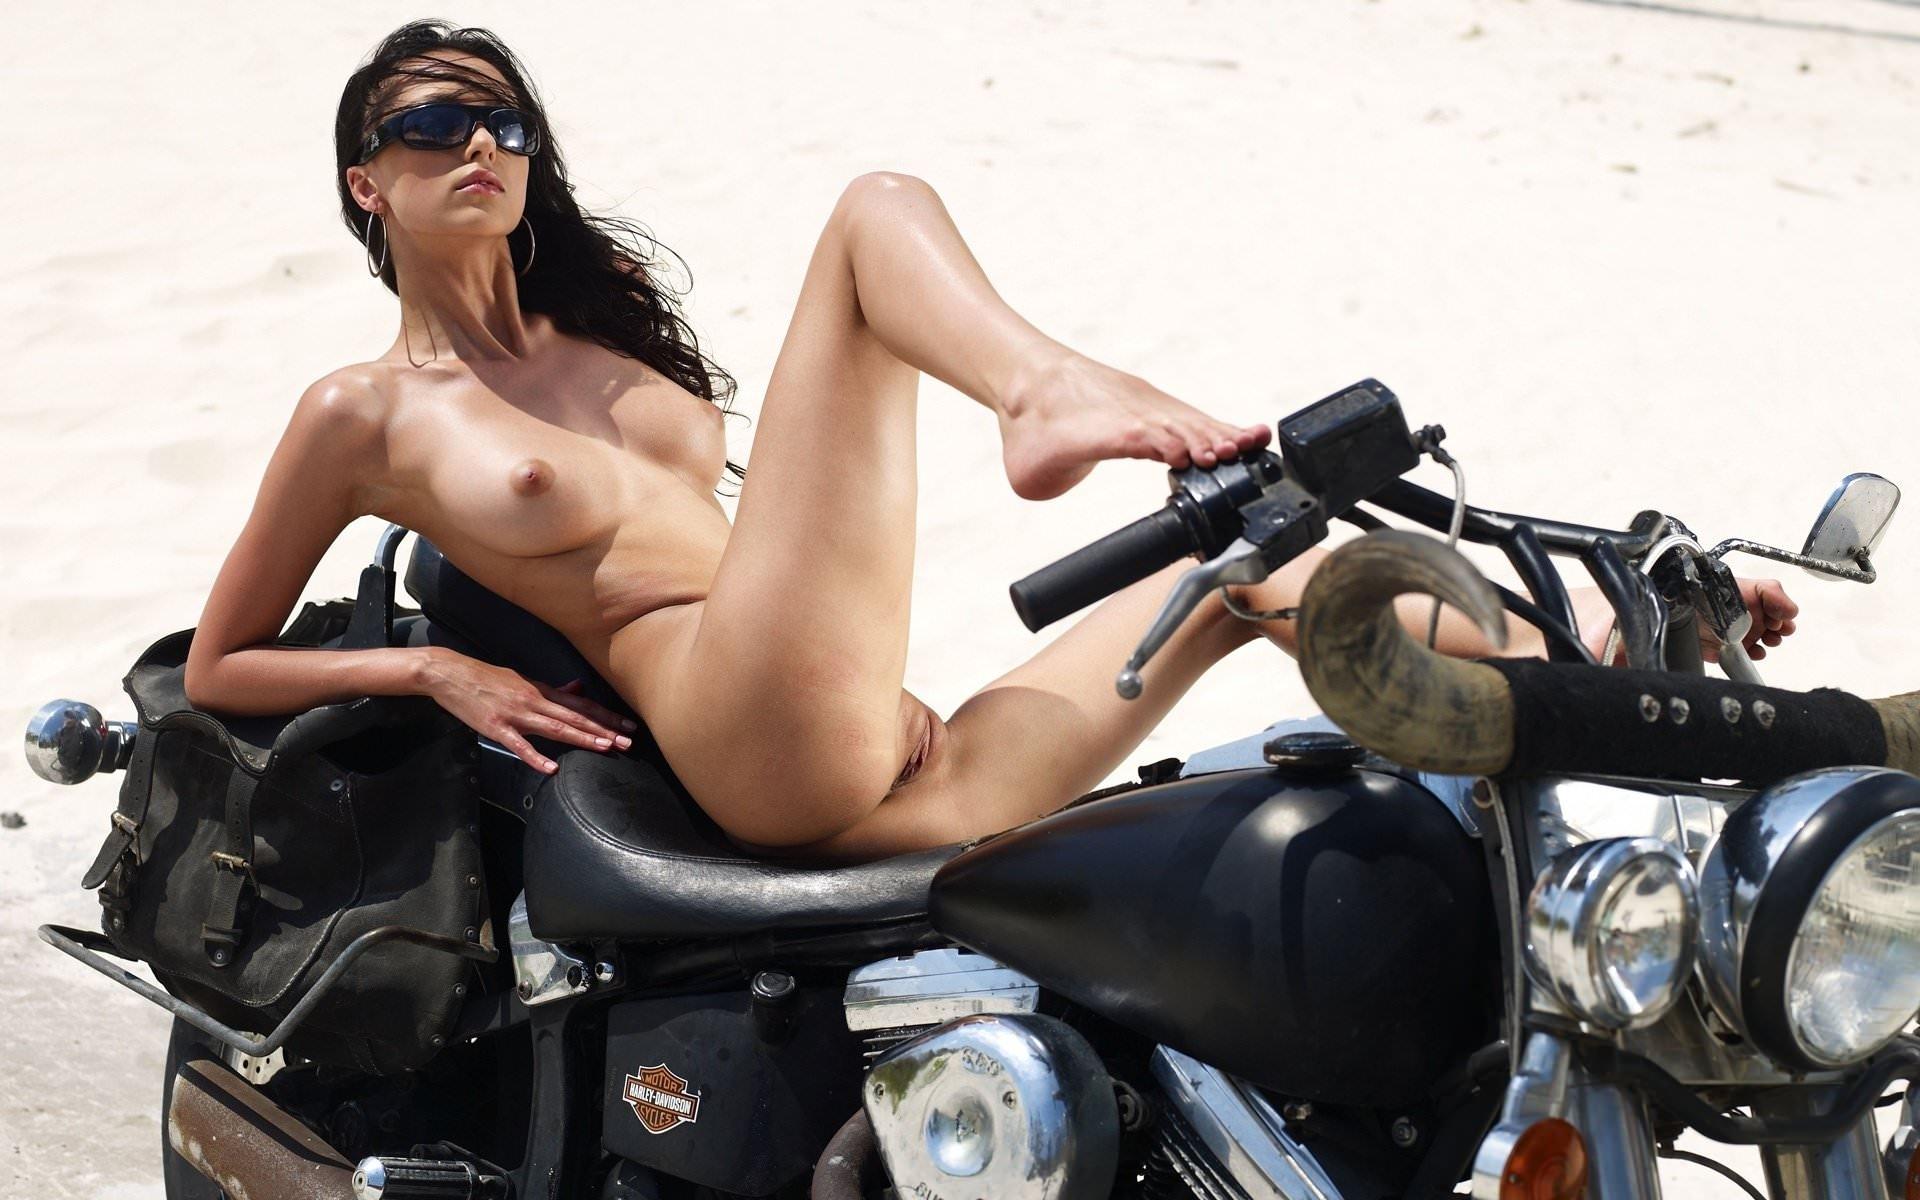 Hot Chicks Nude On Harley